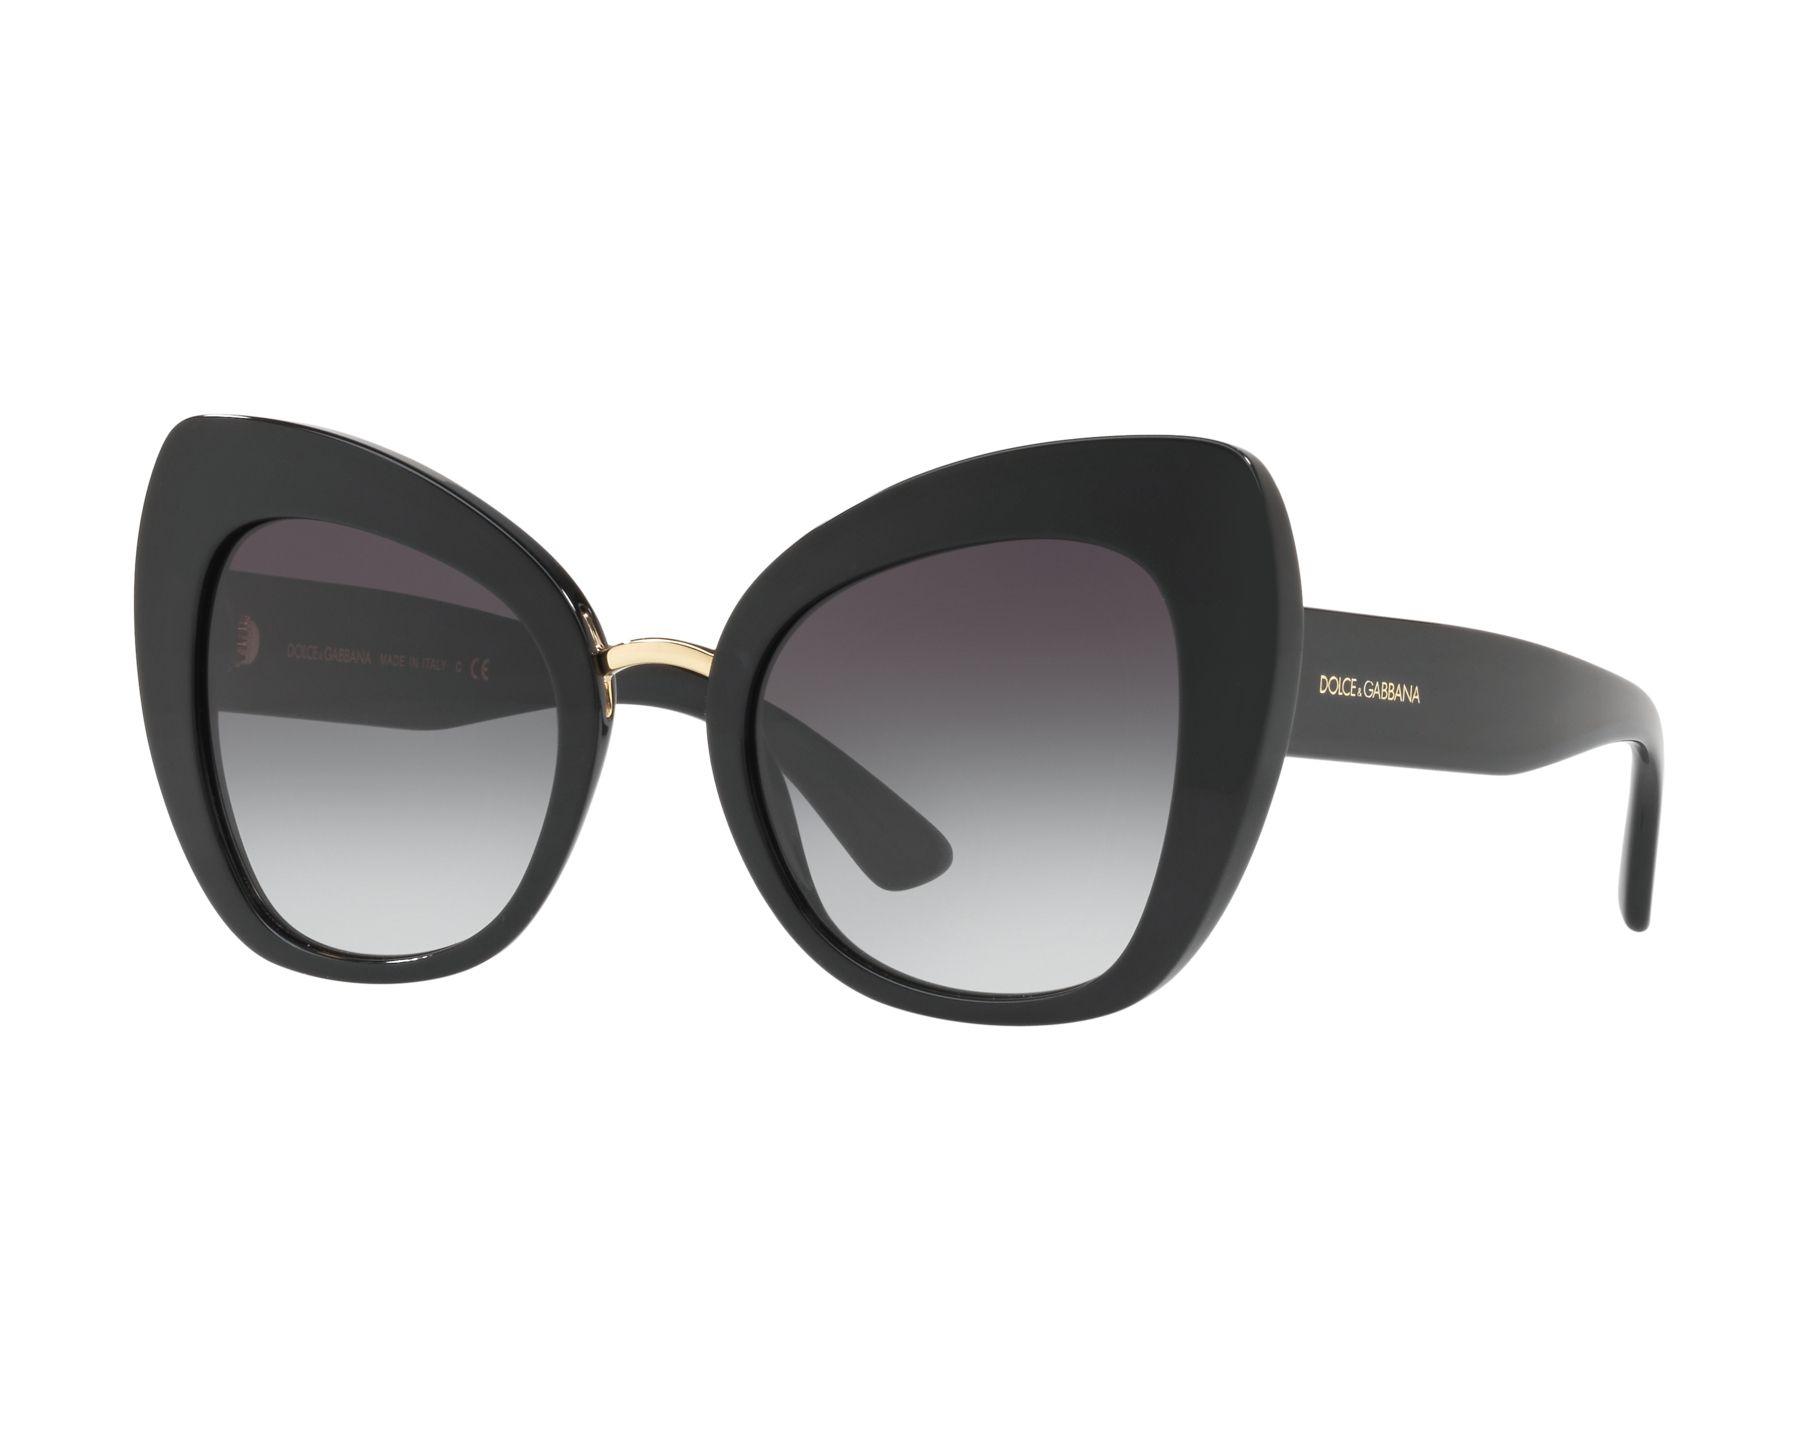 Dolce & Gabbana DG4319 501/8G 51-22 jlx3zRuH